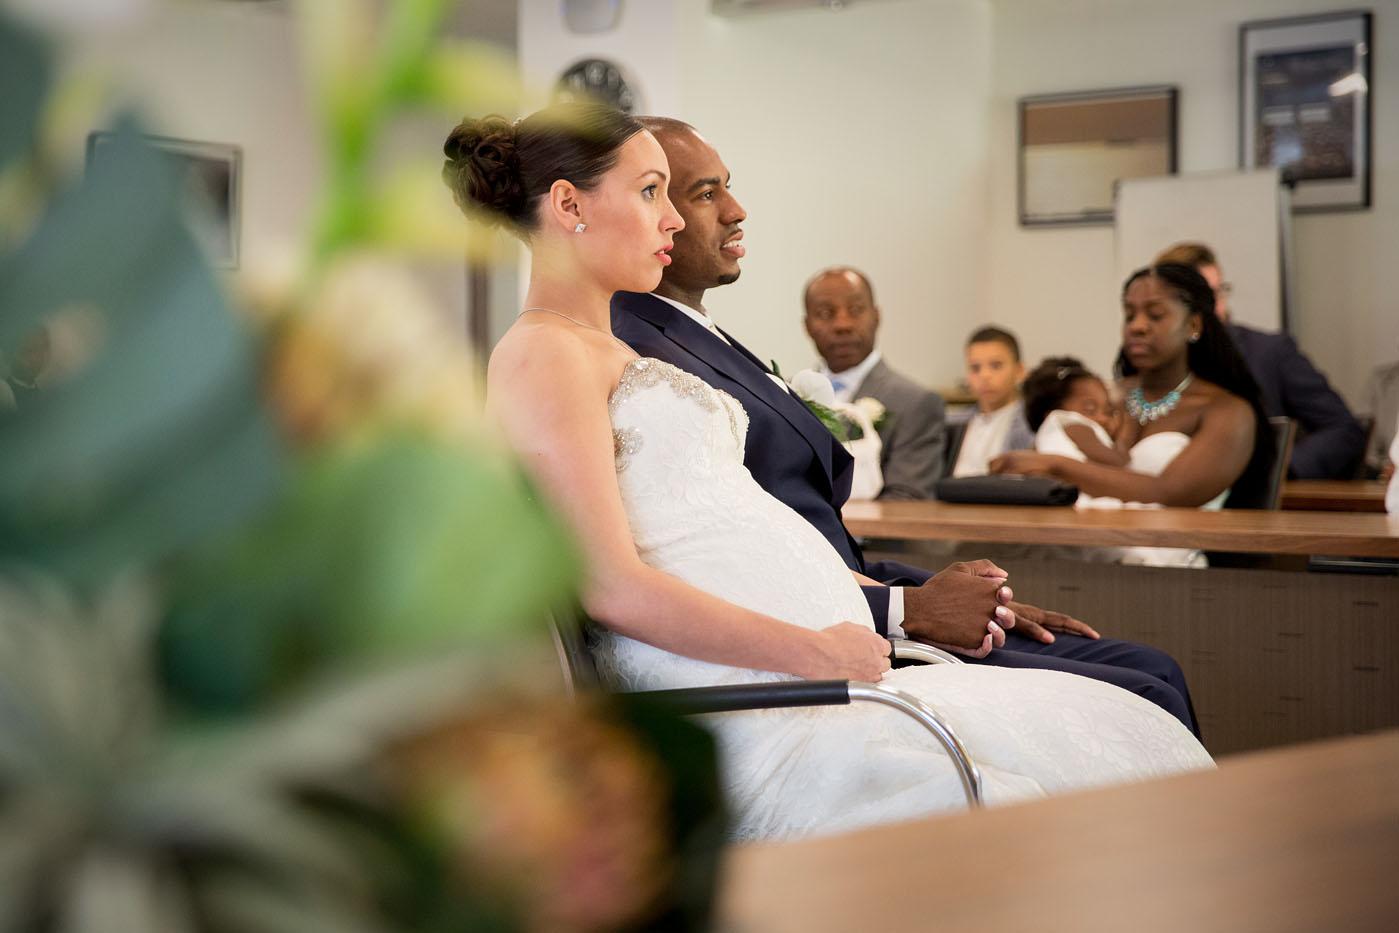 bruiloft-wedding-trouwen-rotterdam-fotograaf-bobhersbach-holdinghands